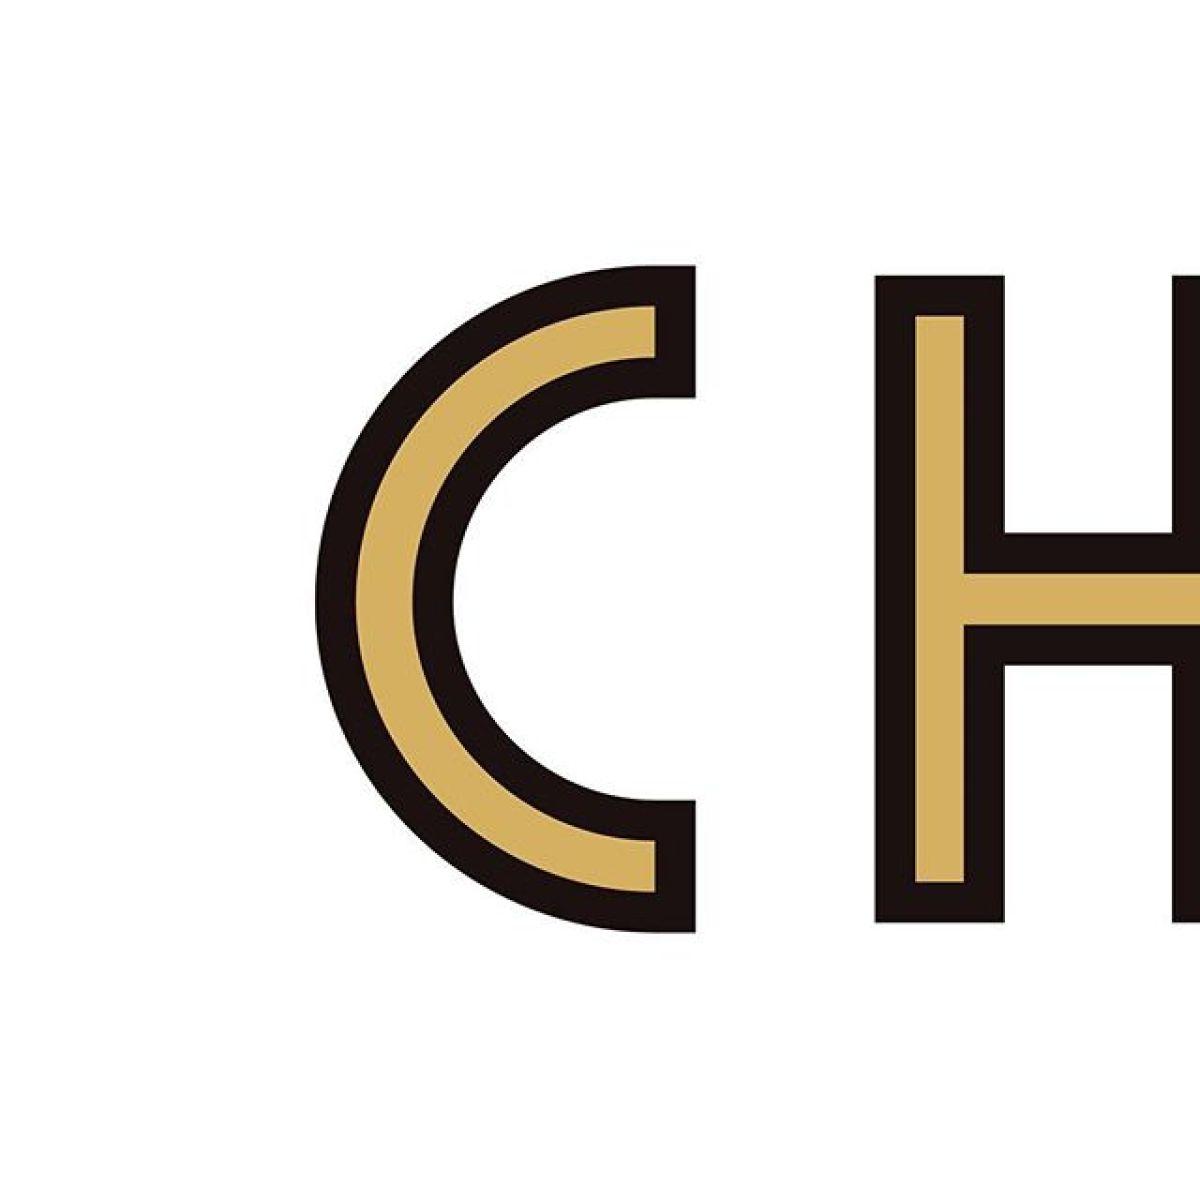 C H — #wip #workinprogress #logo #logotype #type #typography #design #graphicdesign #typeface #logodesign #outline